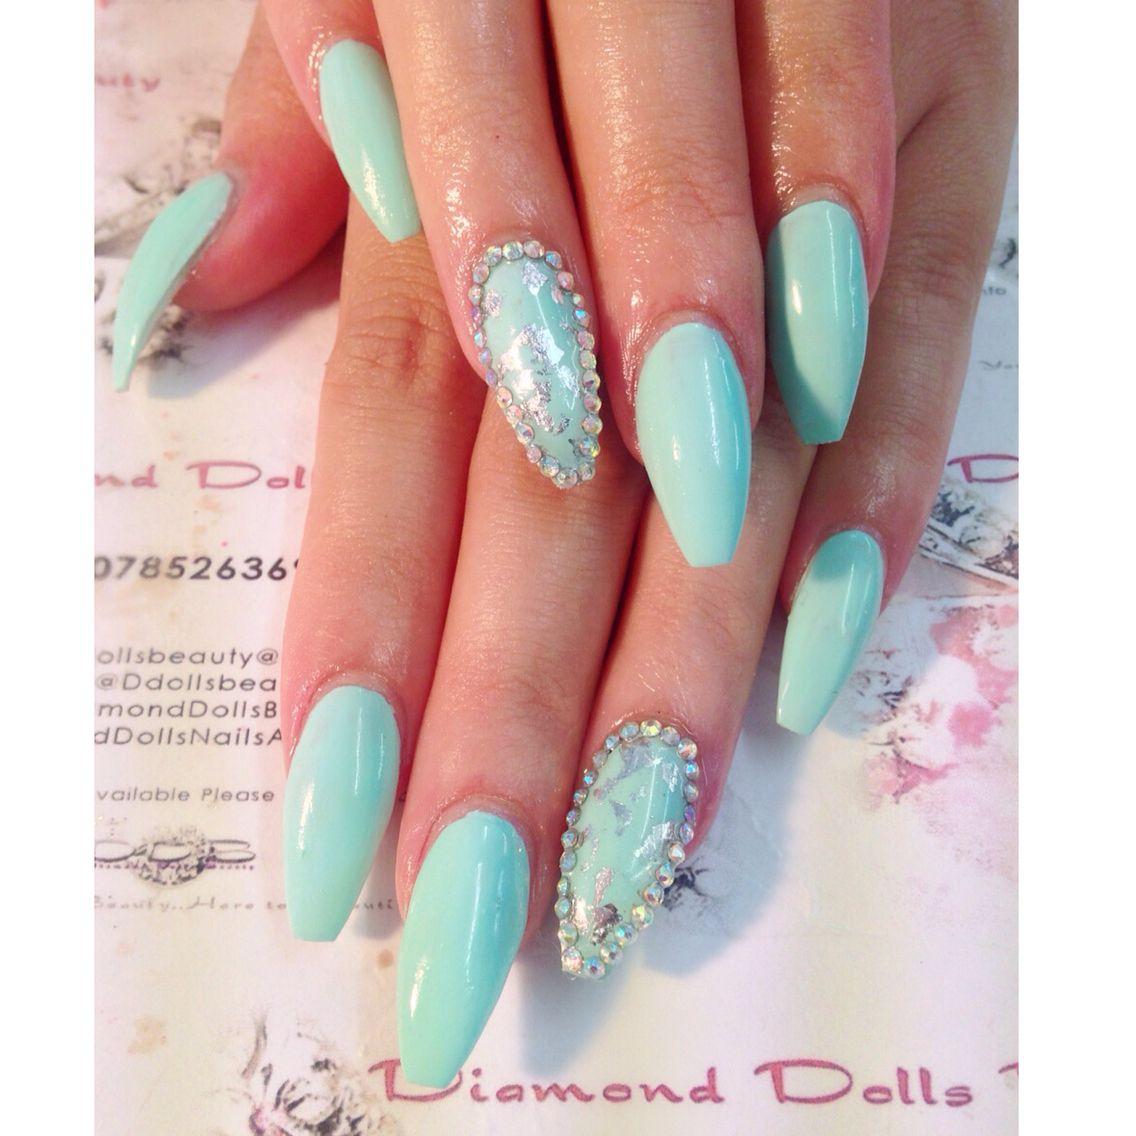 Diamond dolls beauty coffin shape acrylic nails | Coffin Nails ...